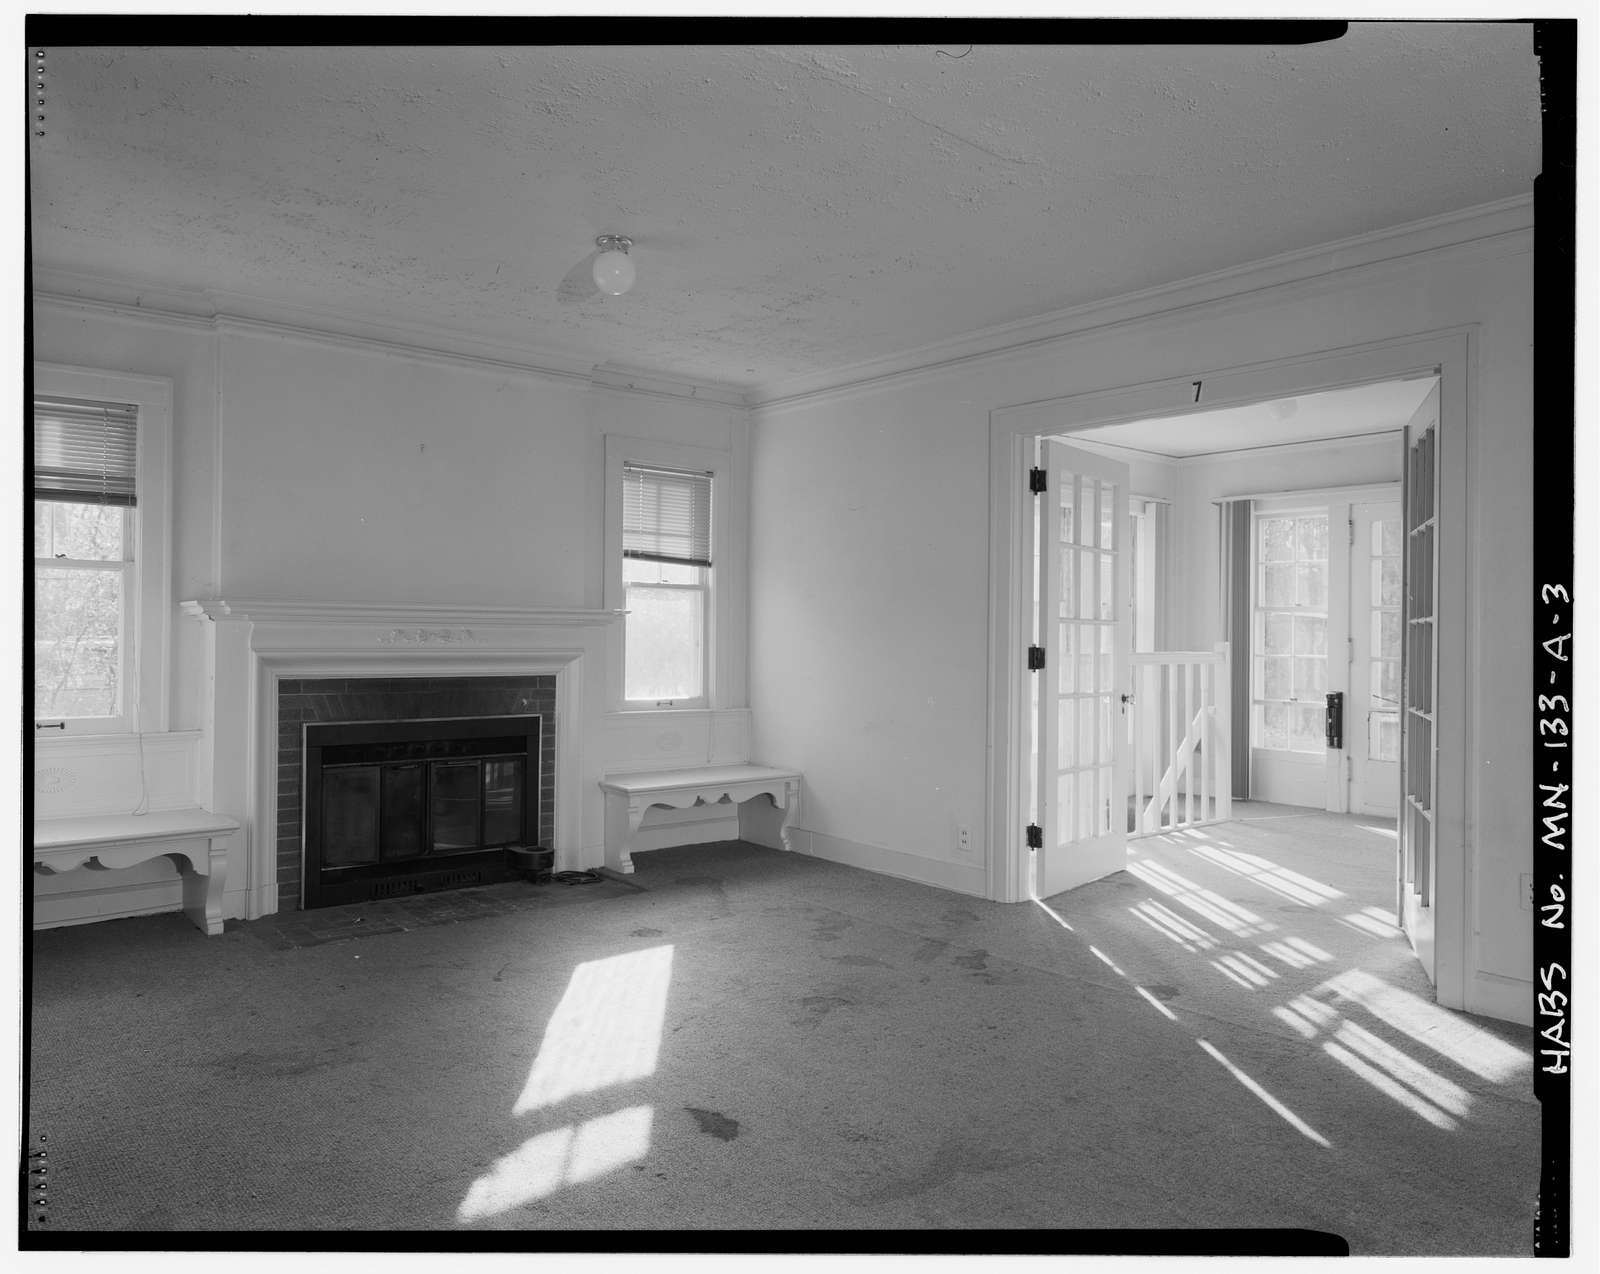 Glen Lake Sanatorium, Superintendent's Residence, County Road 4 at County Road 67, Minnetonka, Hennepin County, MN